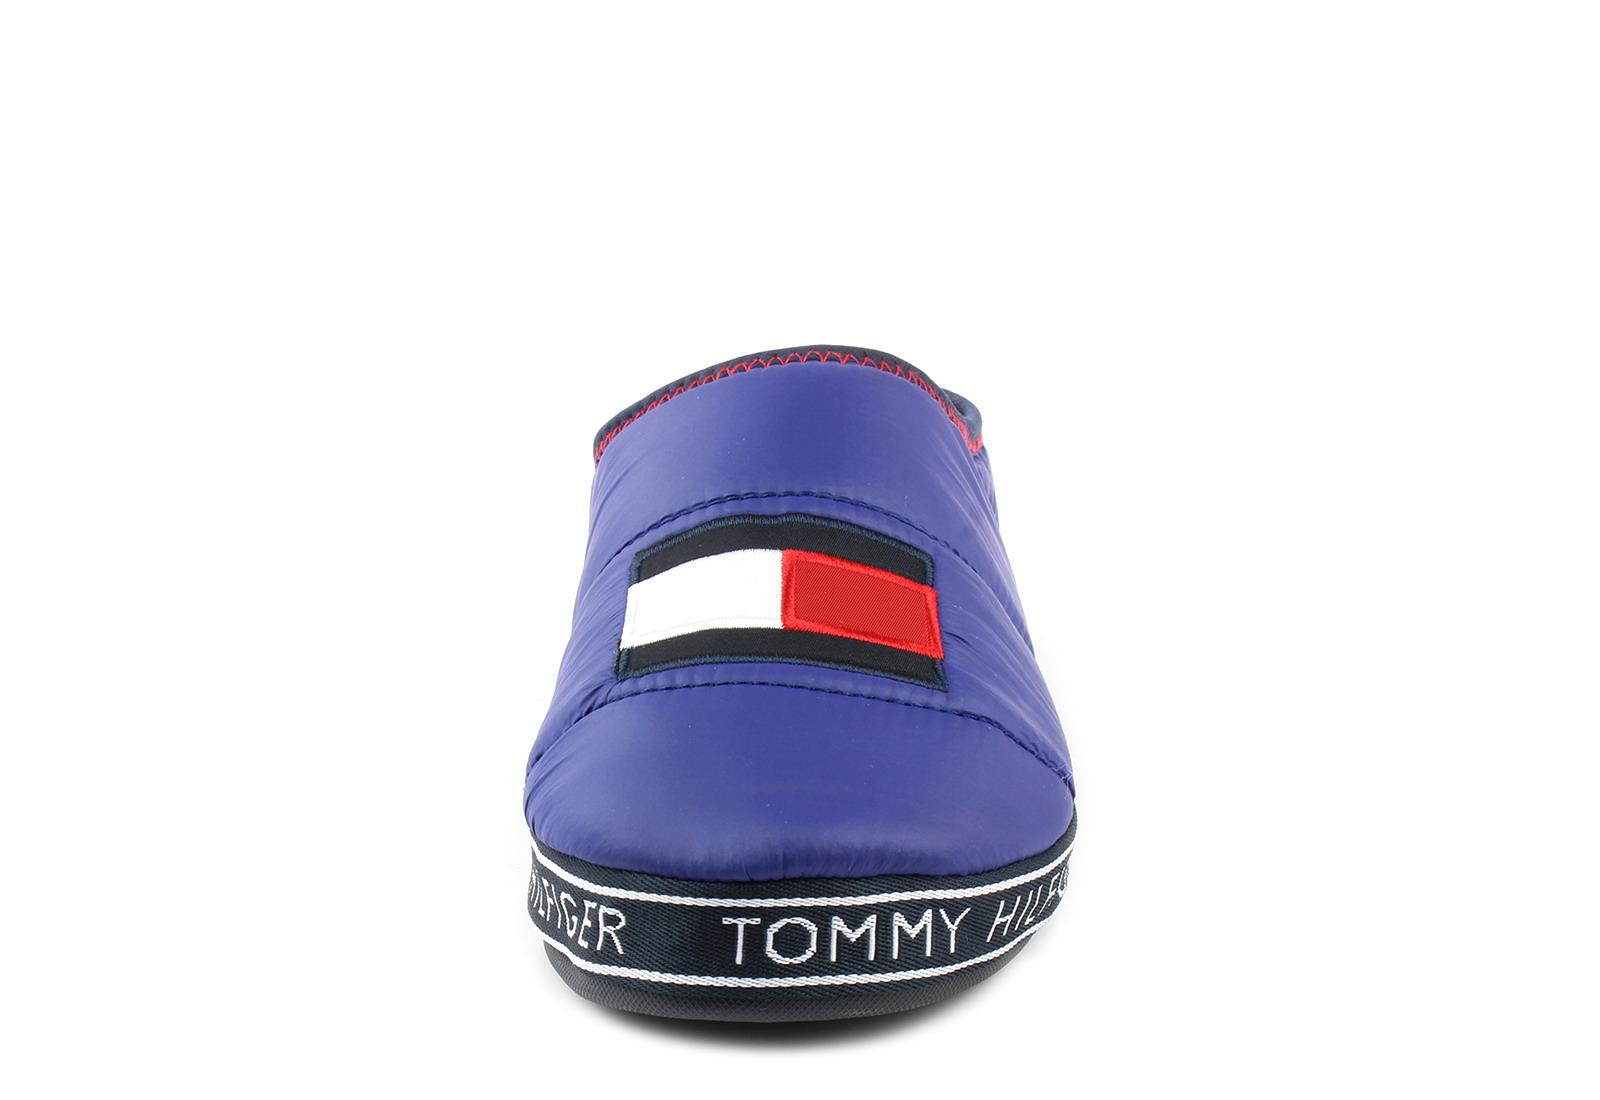 Tommy Hilfiger Papucs - Downslipper 3d - 18H-2004-435 - Office Shoes ... 913cb89a7e